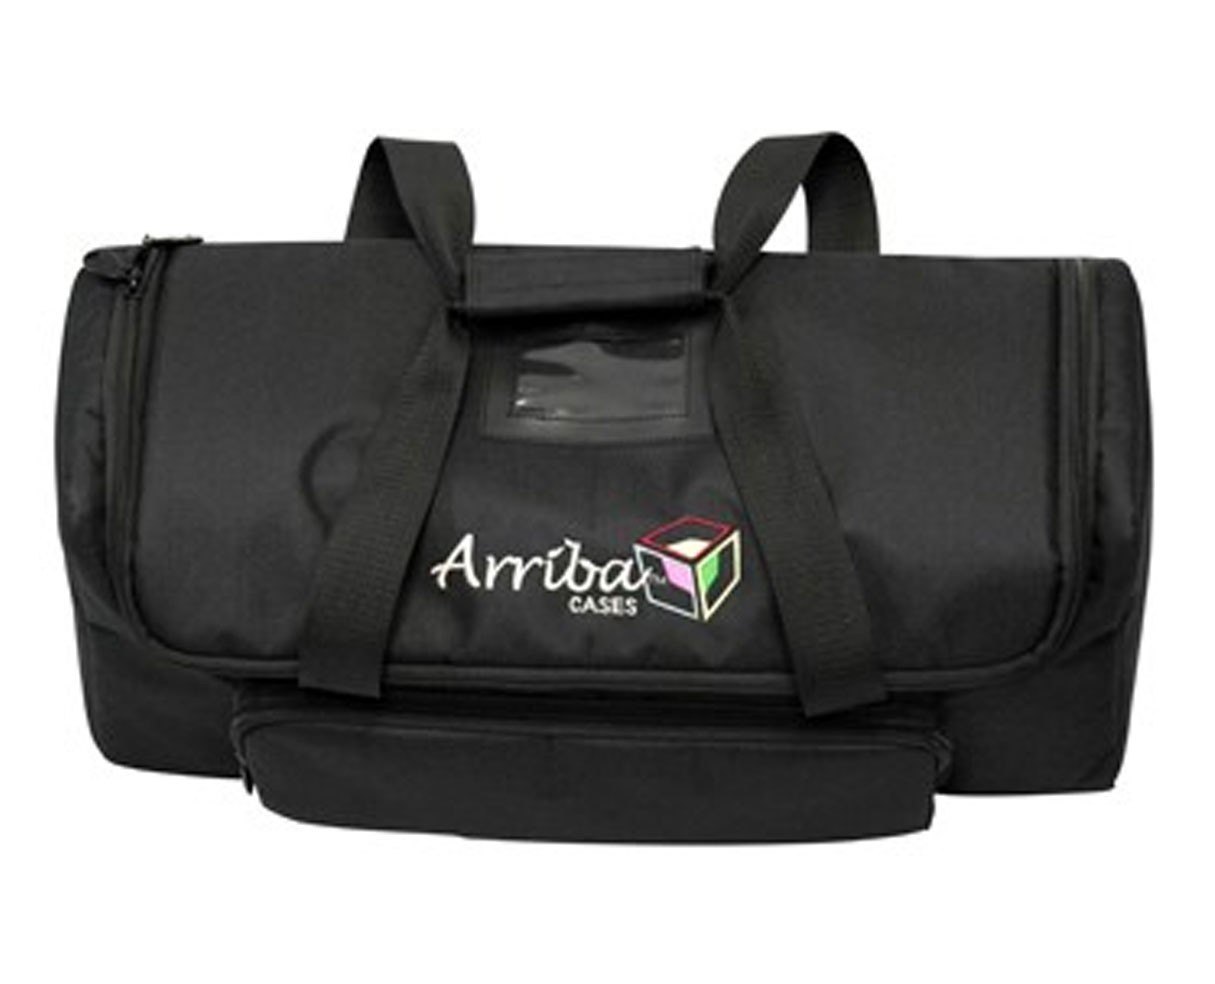 Arriba Cases AC-427